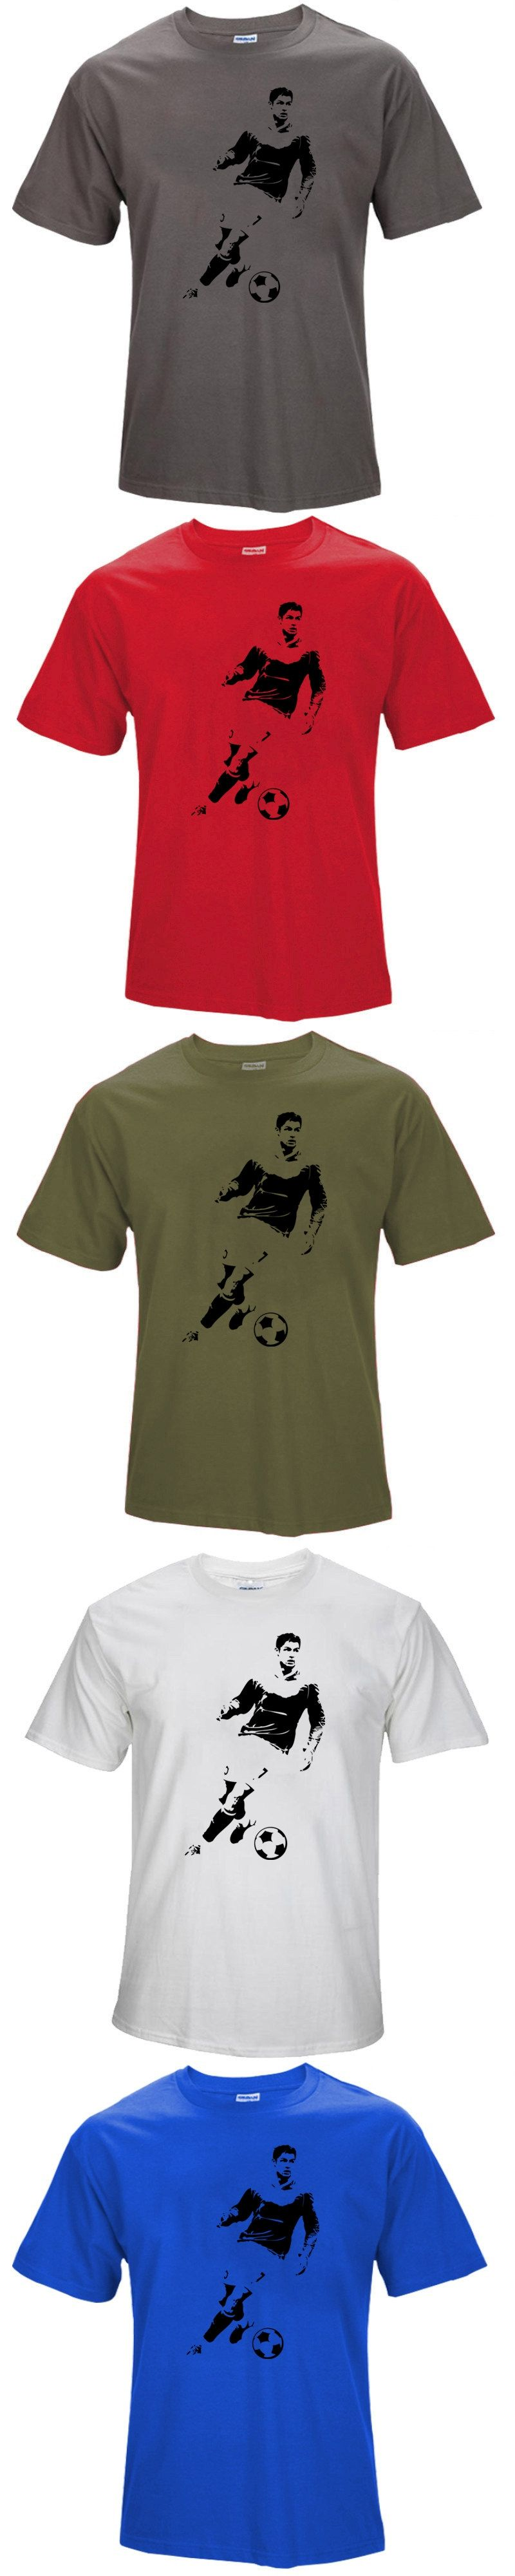 2016 Summer World Cup Cristiano Ronaldo Mens T Shirt 2017 Camiseta Fashion Big Size Spain 3xl Barcelonae Barcelona Casual Cotton S172